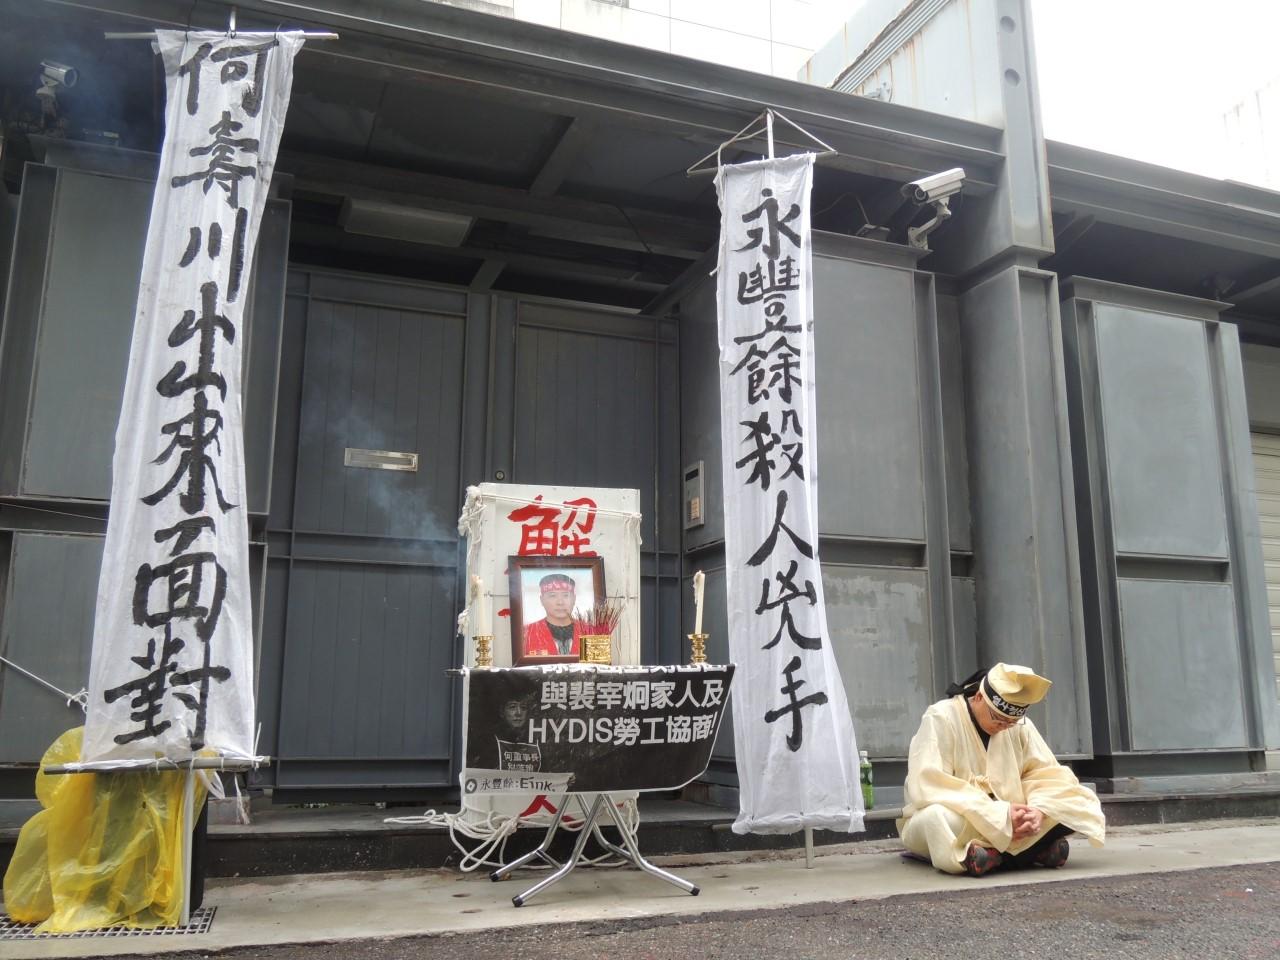 20150526-SMG0045-006-Hydis裴宰炯遺孀與工人來台抗議-設靈堂-葉瑜娟攝.jpg